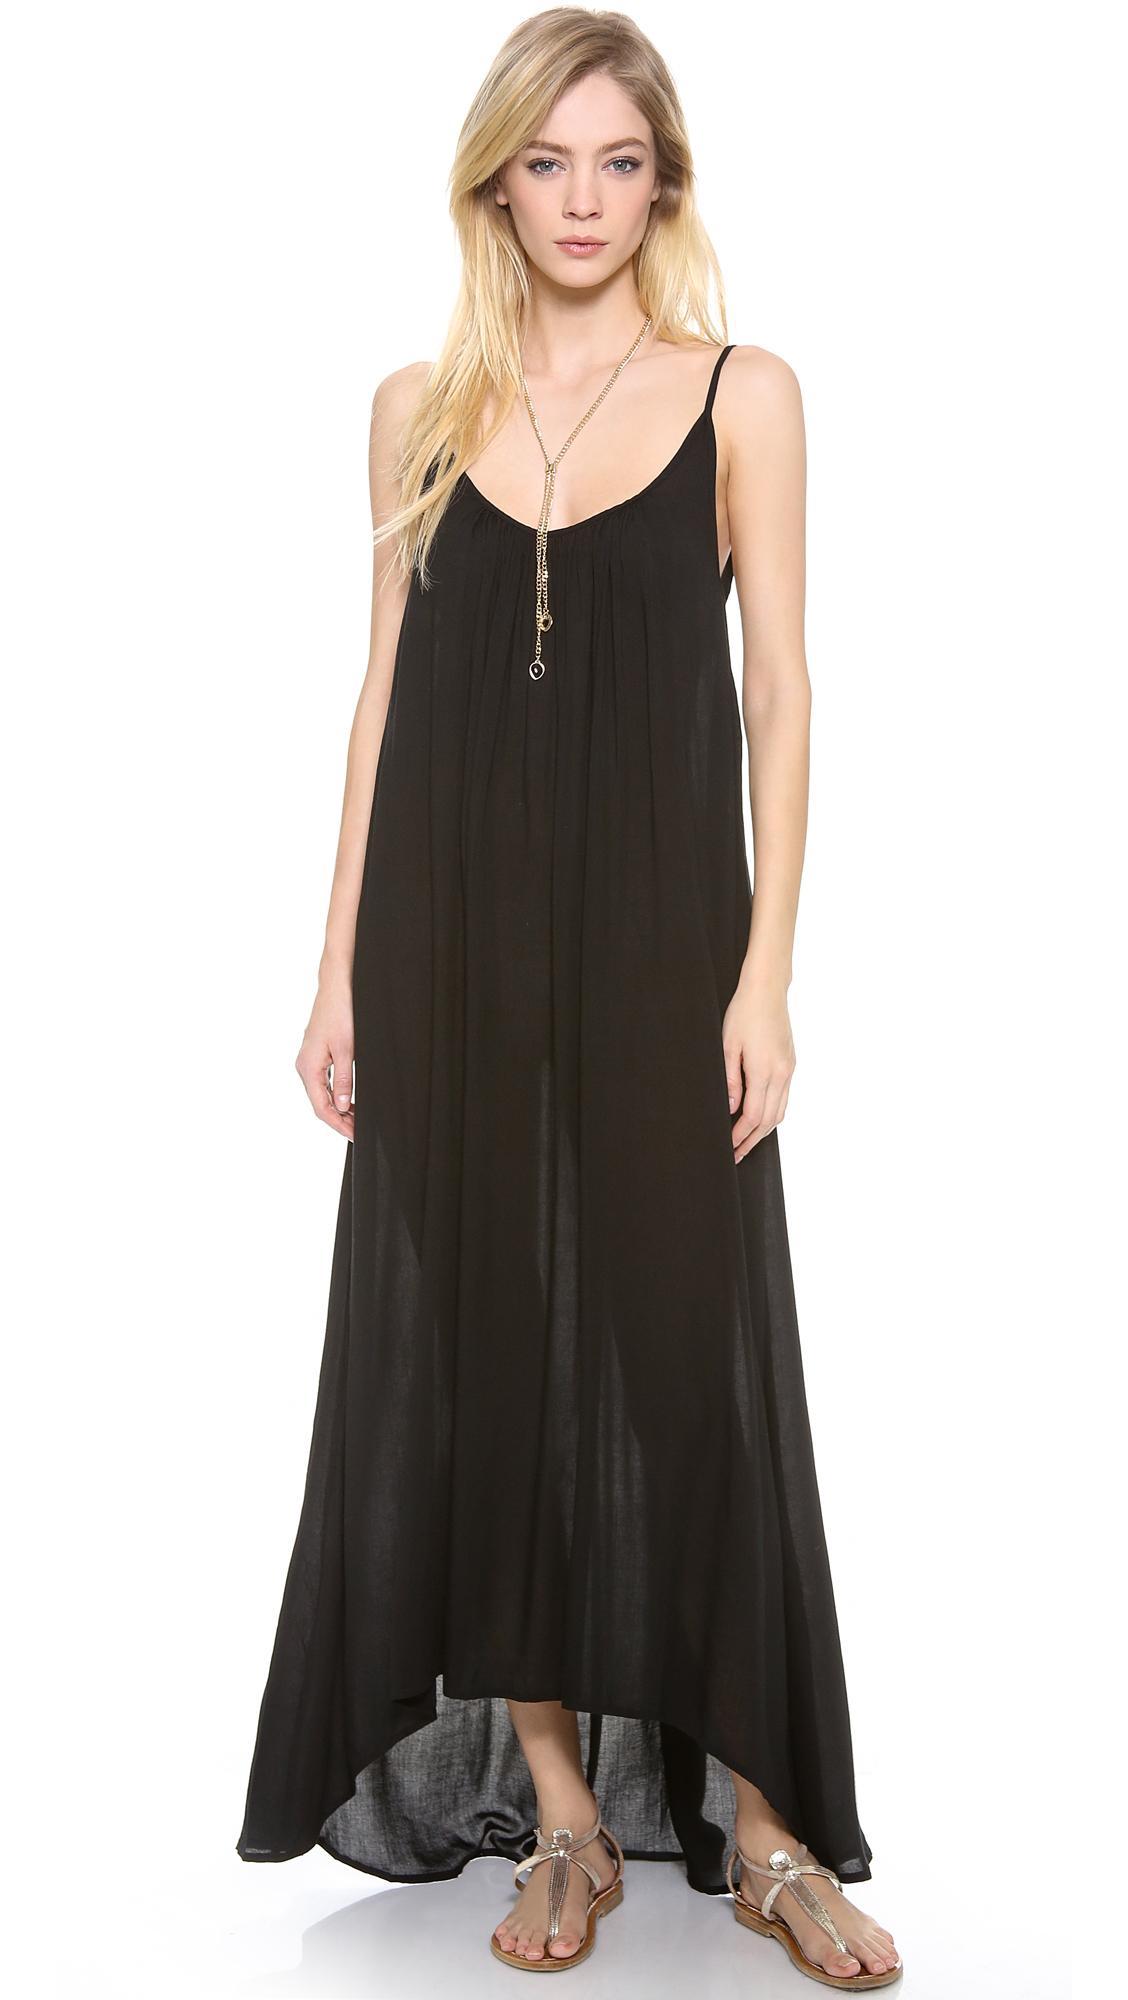 Mikoh swimwear Biarritz Cover Up Dress in Black